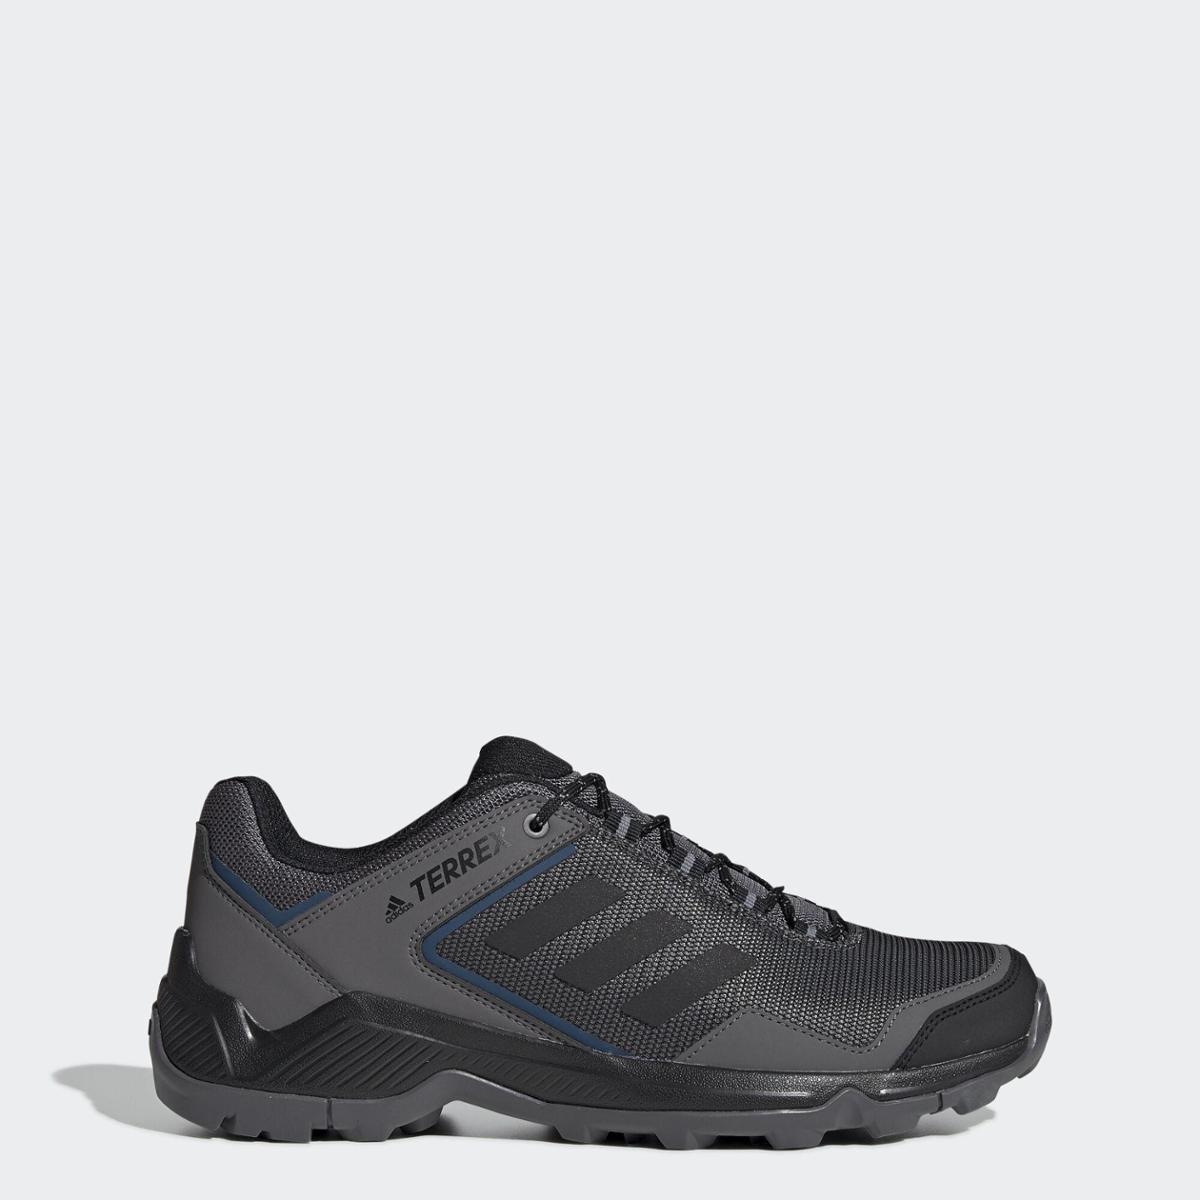 Tênis Terrex Eastrail Adidas Cinza